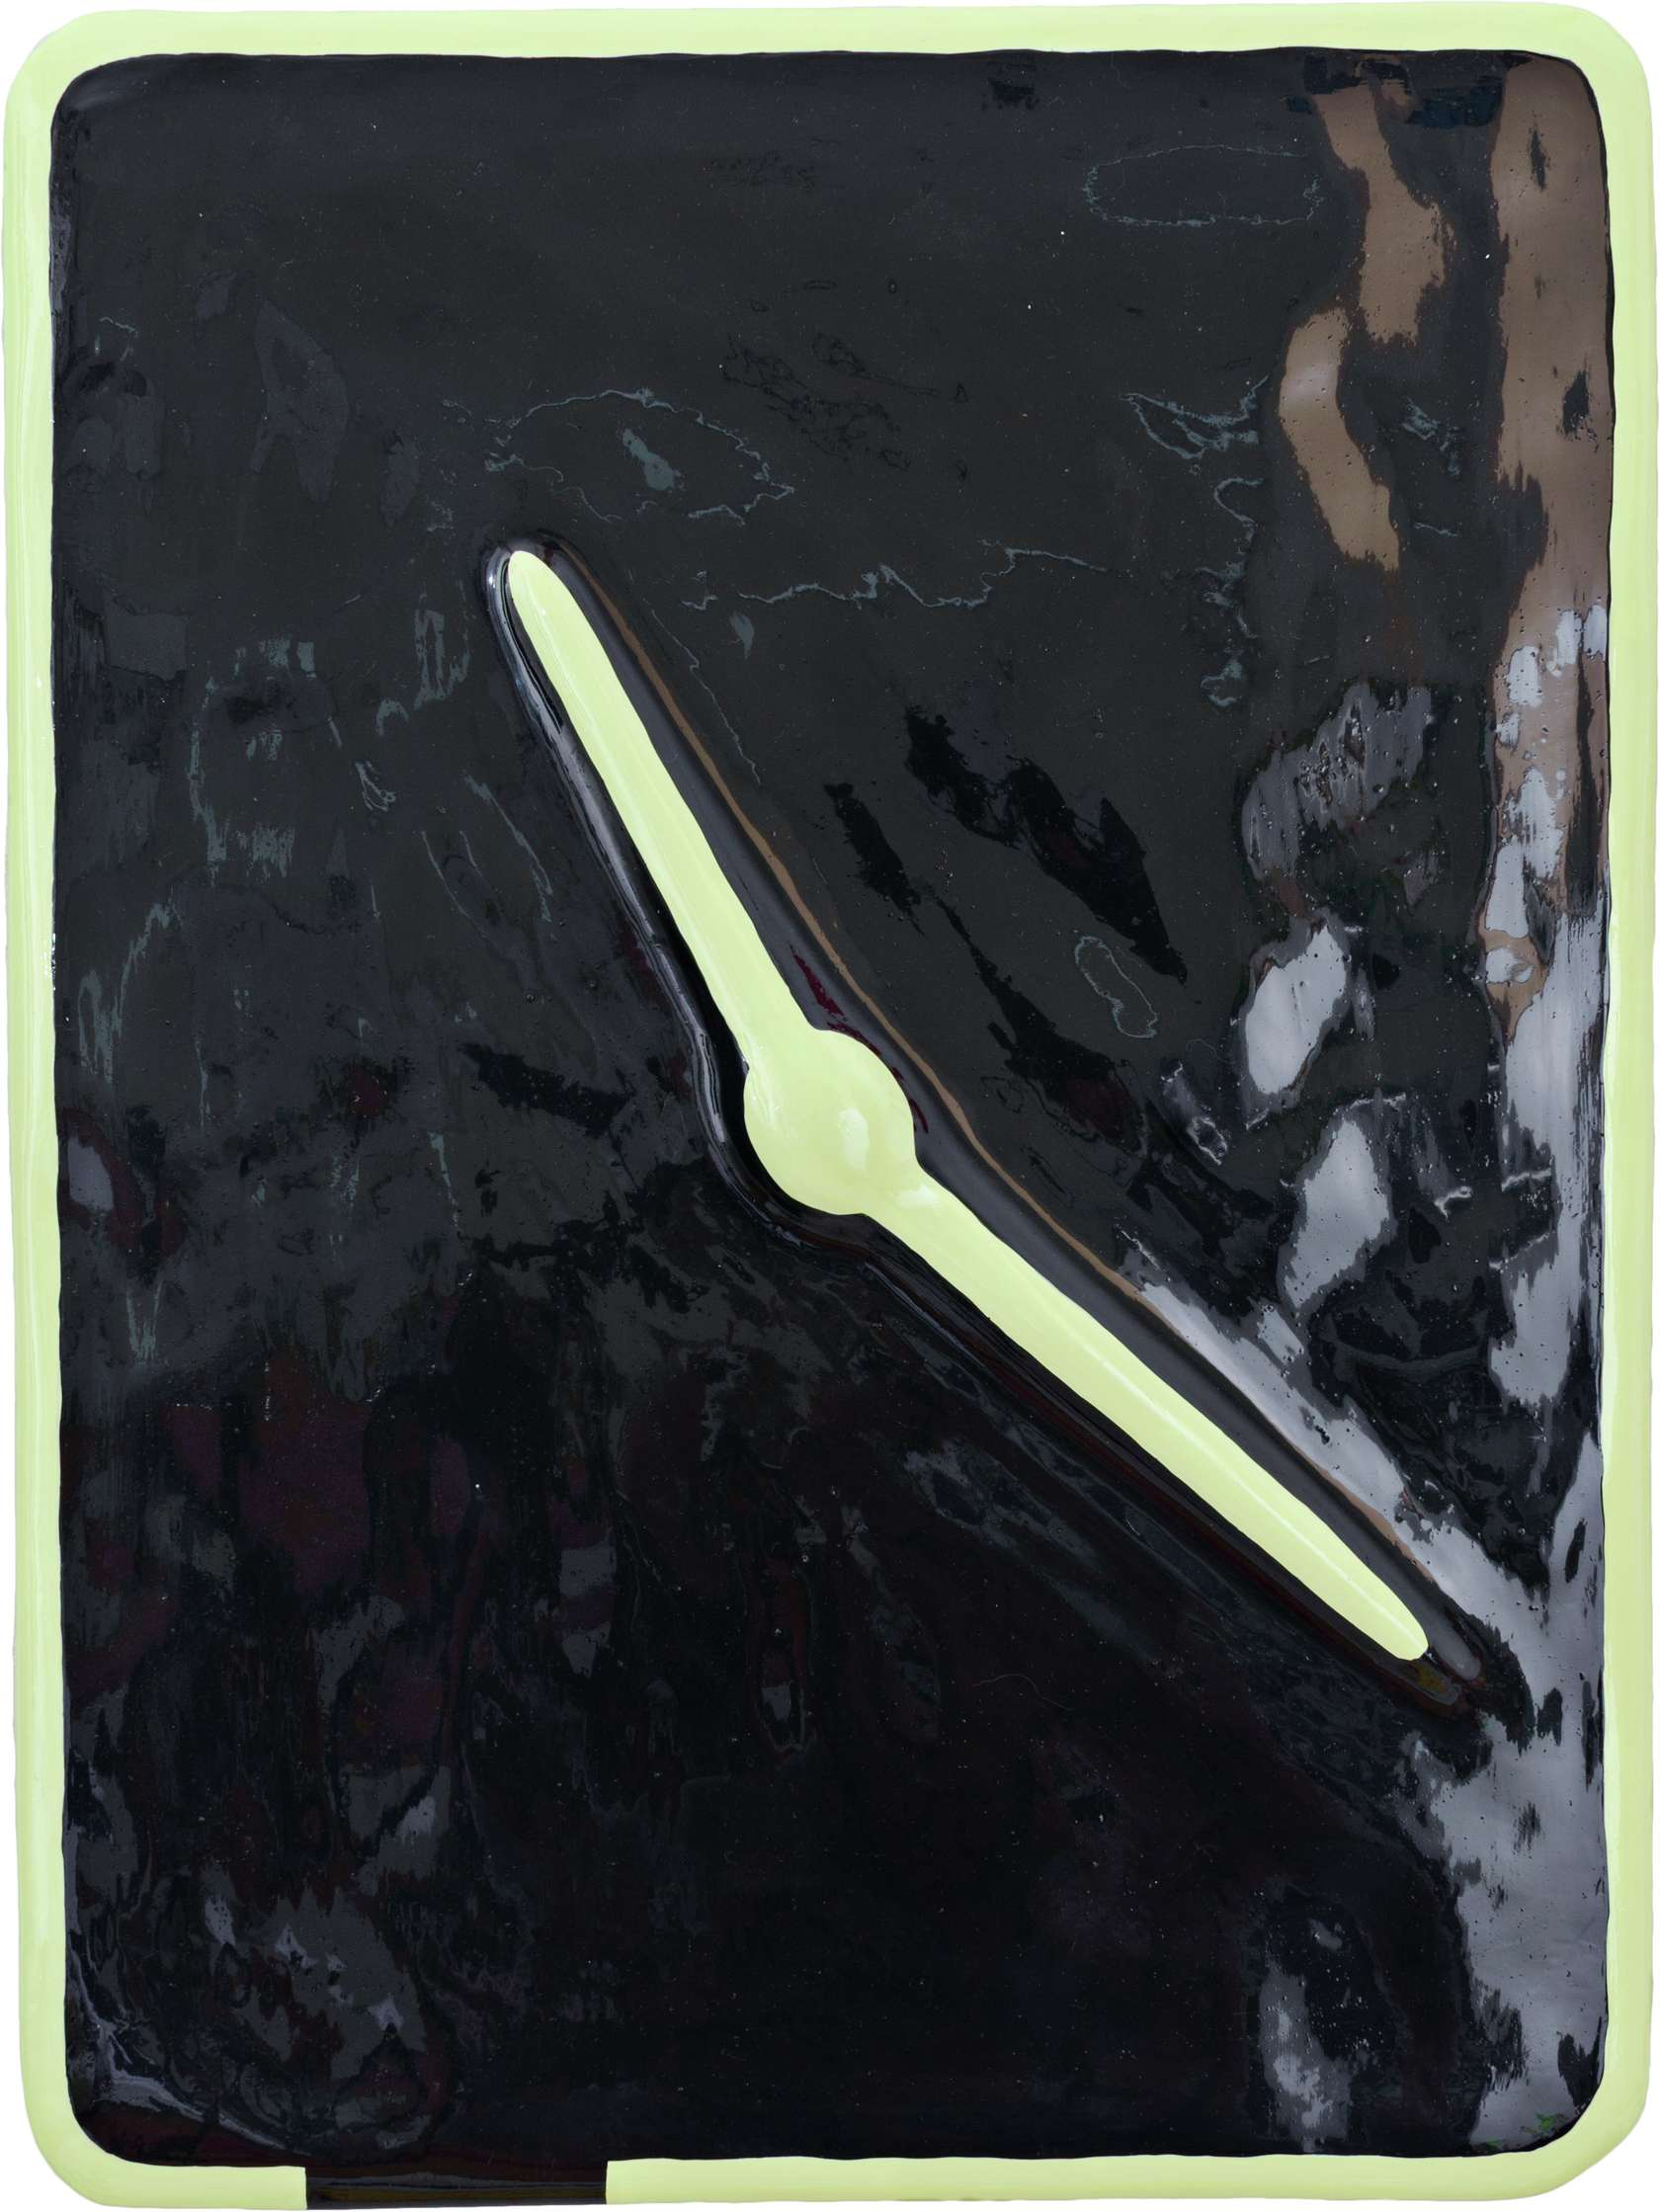 Louis Gary, Time, 2019 Polystyrène, bois, plâtre, peinture50 × 37 × 2 cm / 19 5/8 × 14 5/8 × 6/8 in.